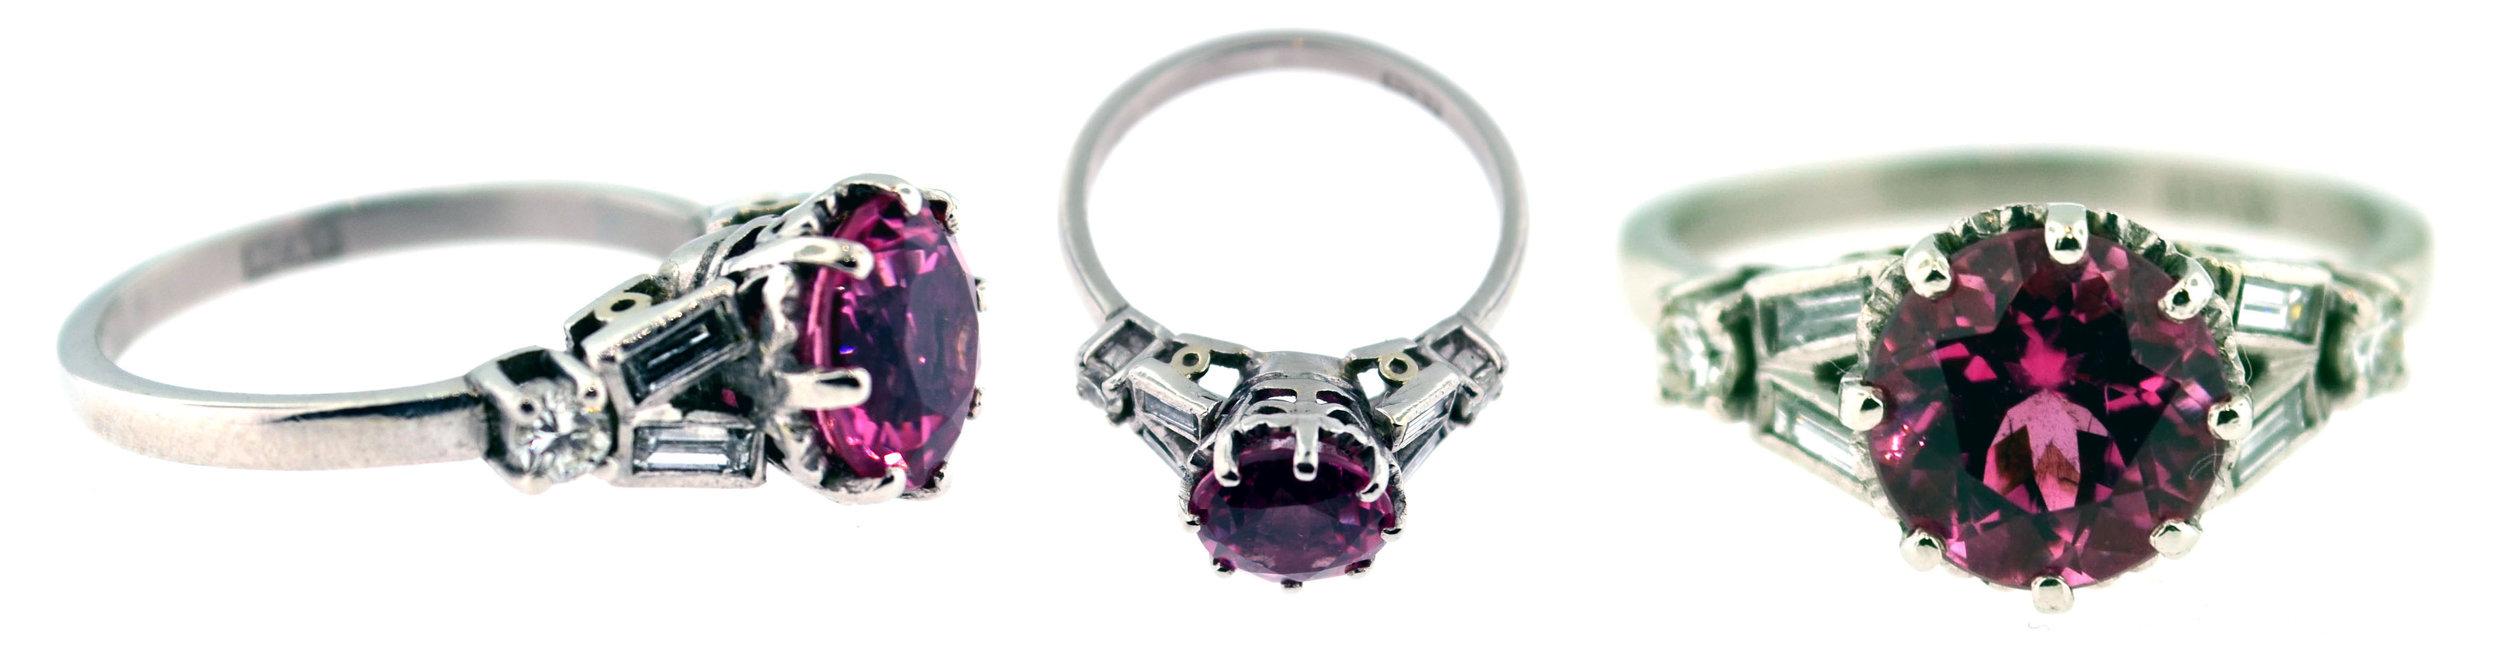 R3854, a platinum mounting, set with 0.25 carats of round and baguette-cut diamonds, and a 1.93 carat pink tourmaline center. Art Deco, circa 1930s.